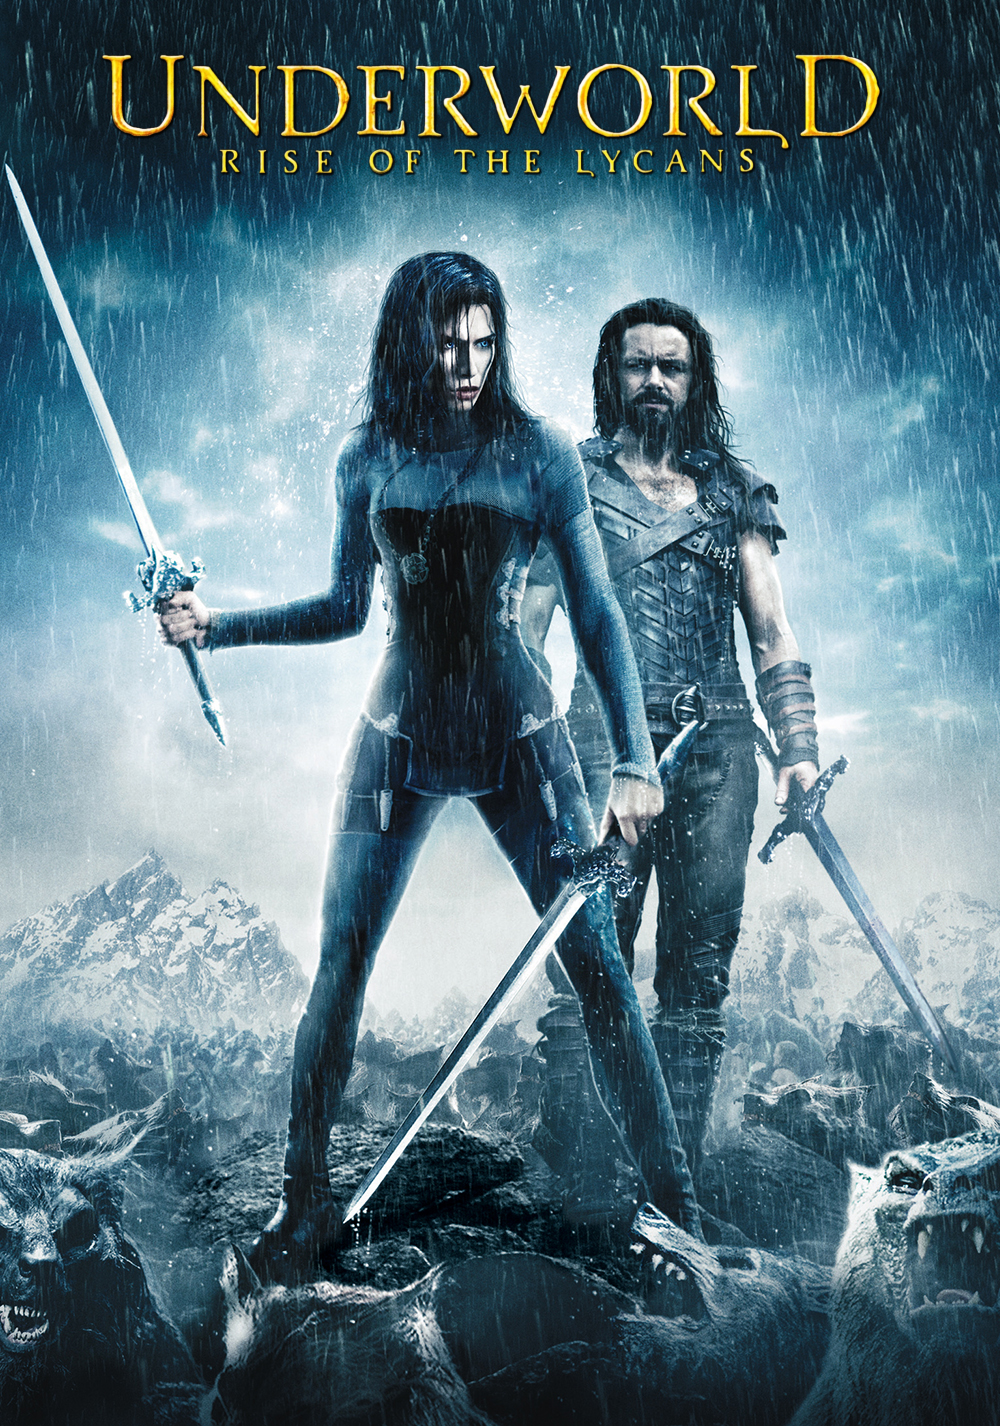 Underworld Rise of the Lycans - IMDb